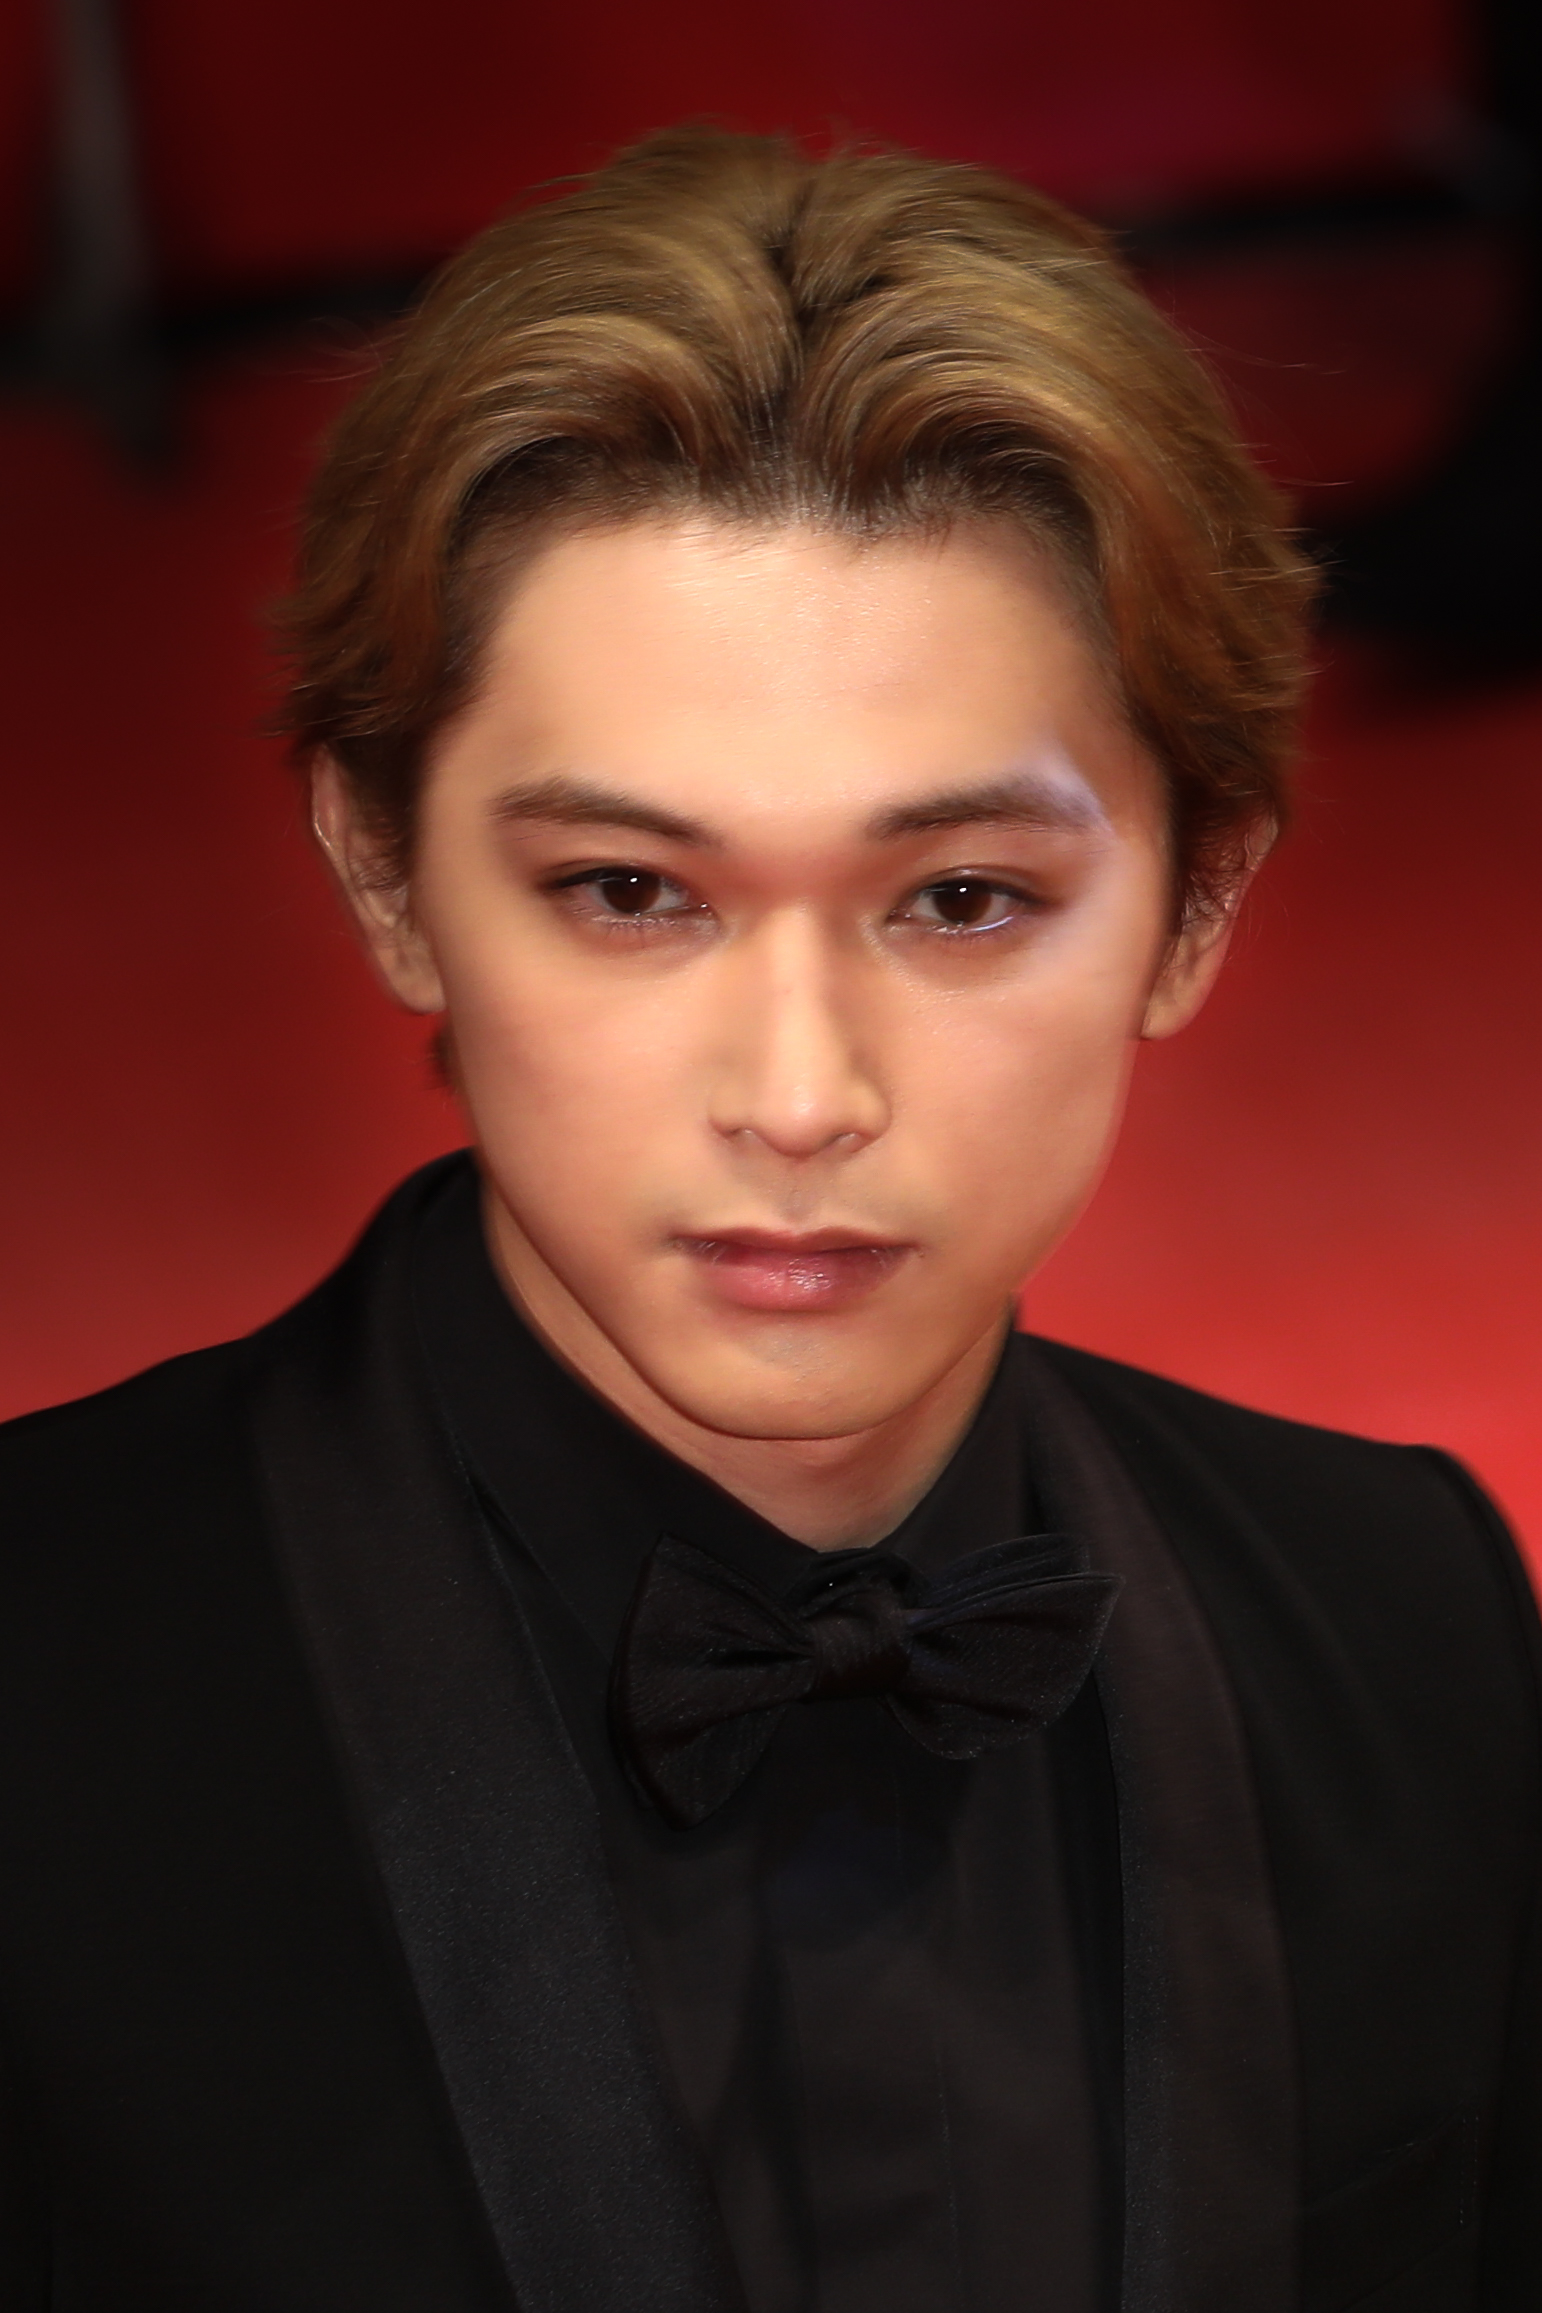 吉沢亮 - Wikipedia